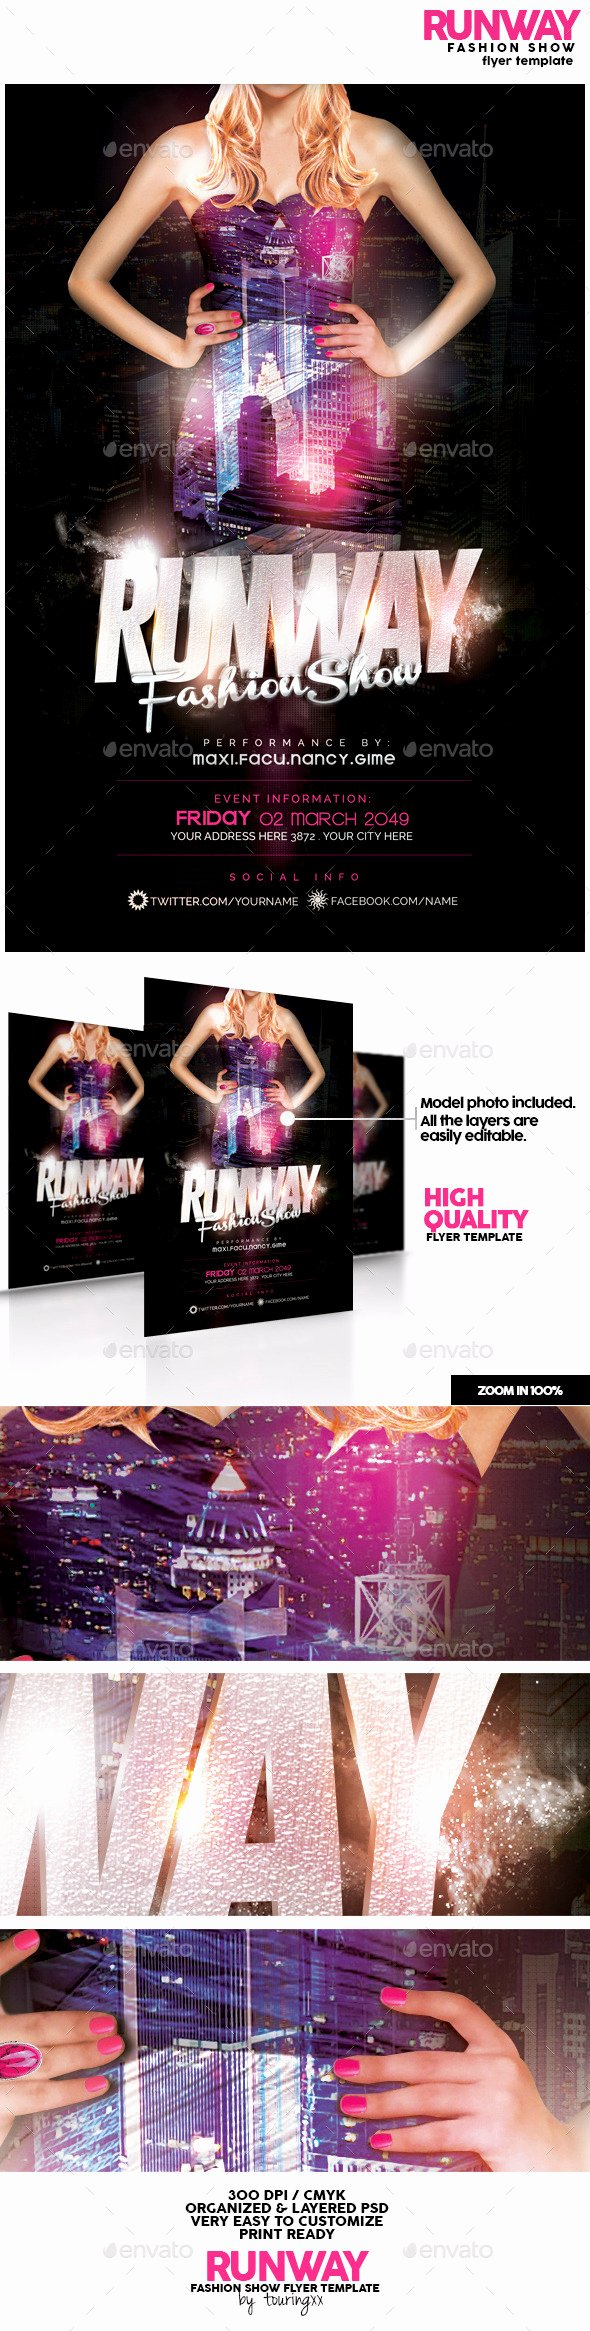 Fashion Show Flyers Template Elegant Runway Fashion Show Flyer Template by touringxx